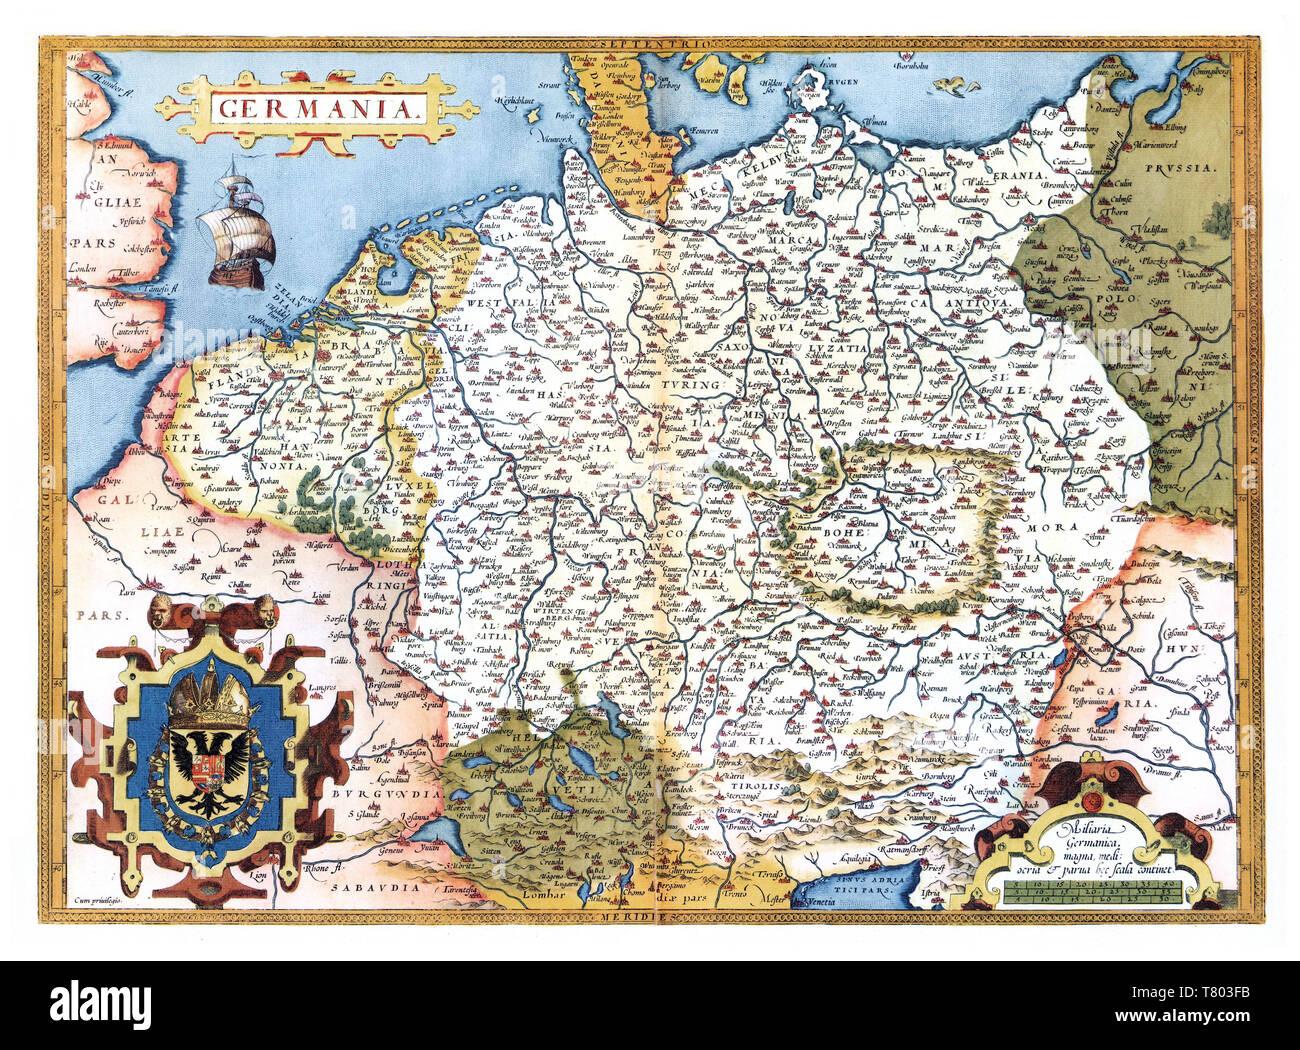 Theatrum Orbis Terrarum, Germany, 1570 - Stock Image